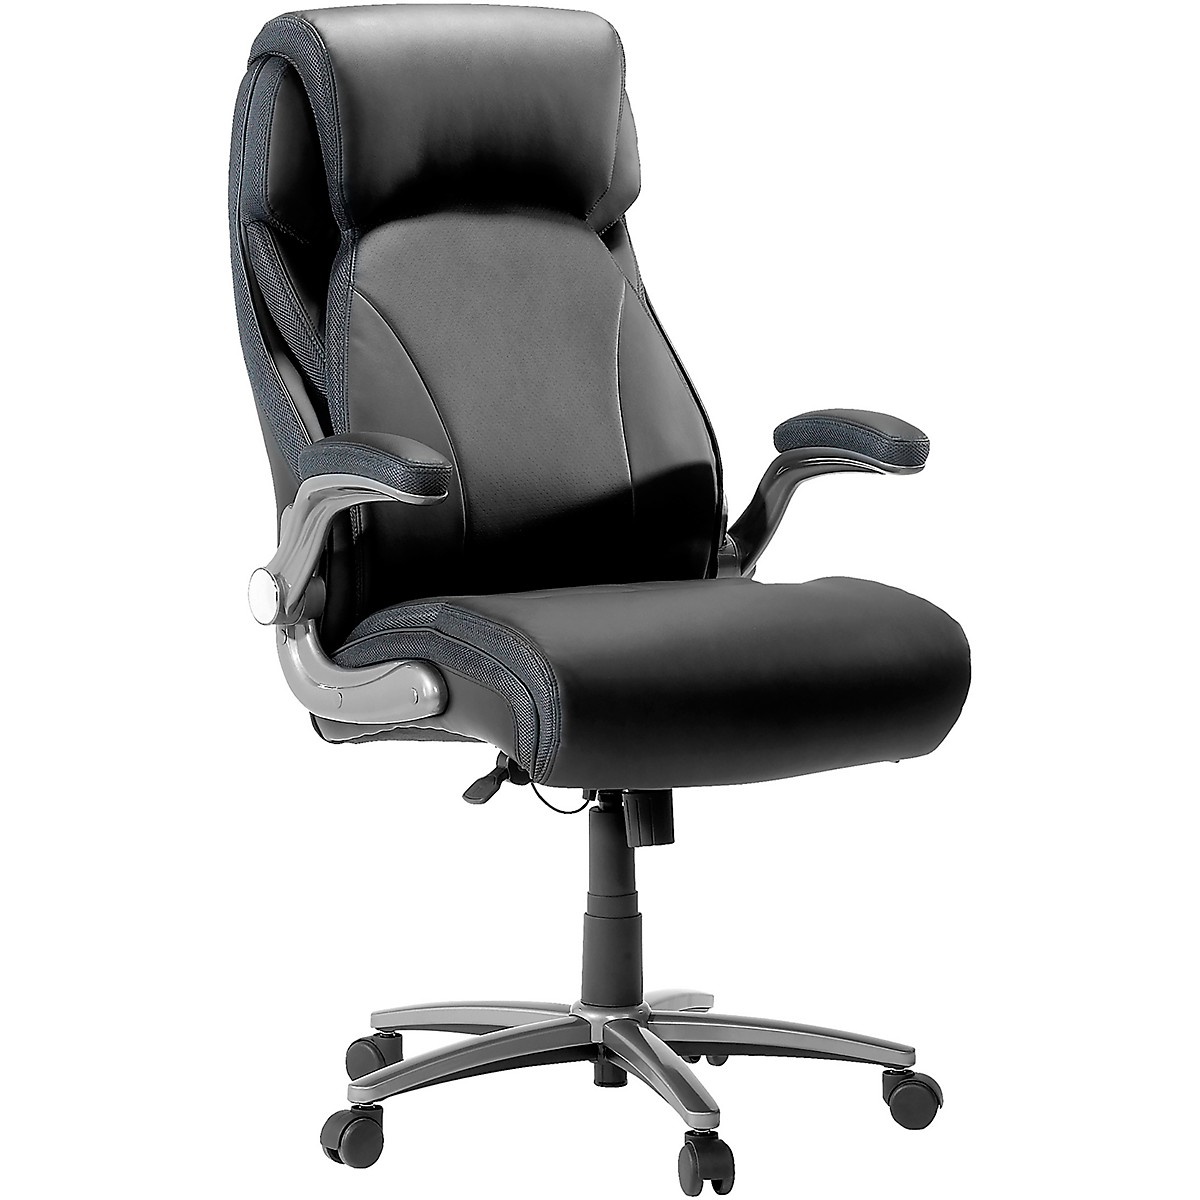 SAUDER WOODWORKING CO. Big & Tall Office Chair Black